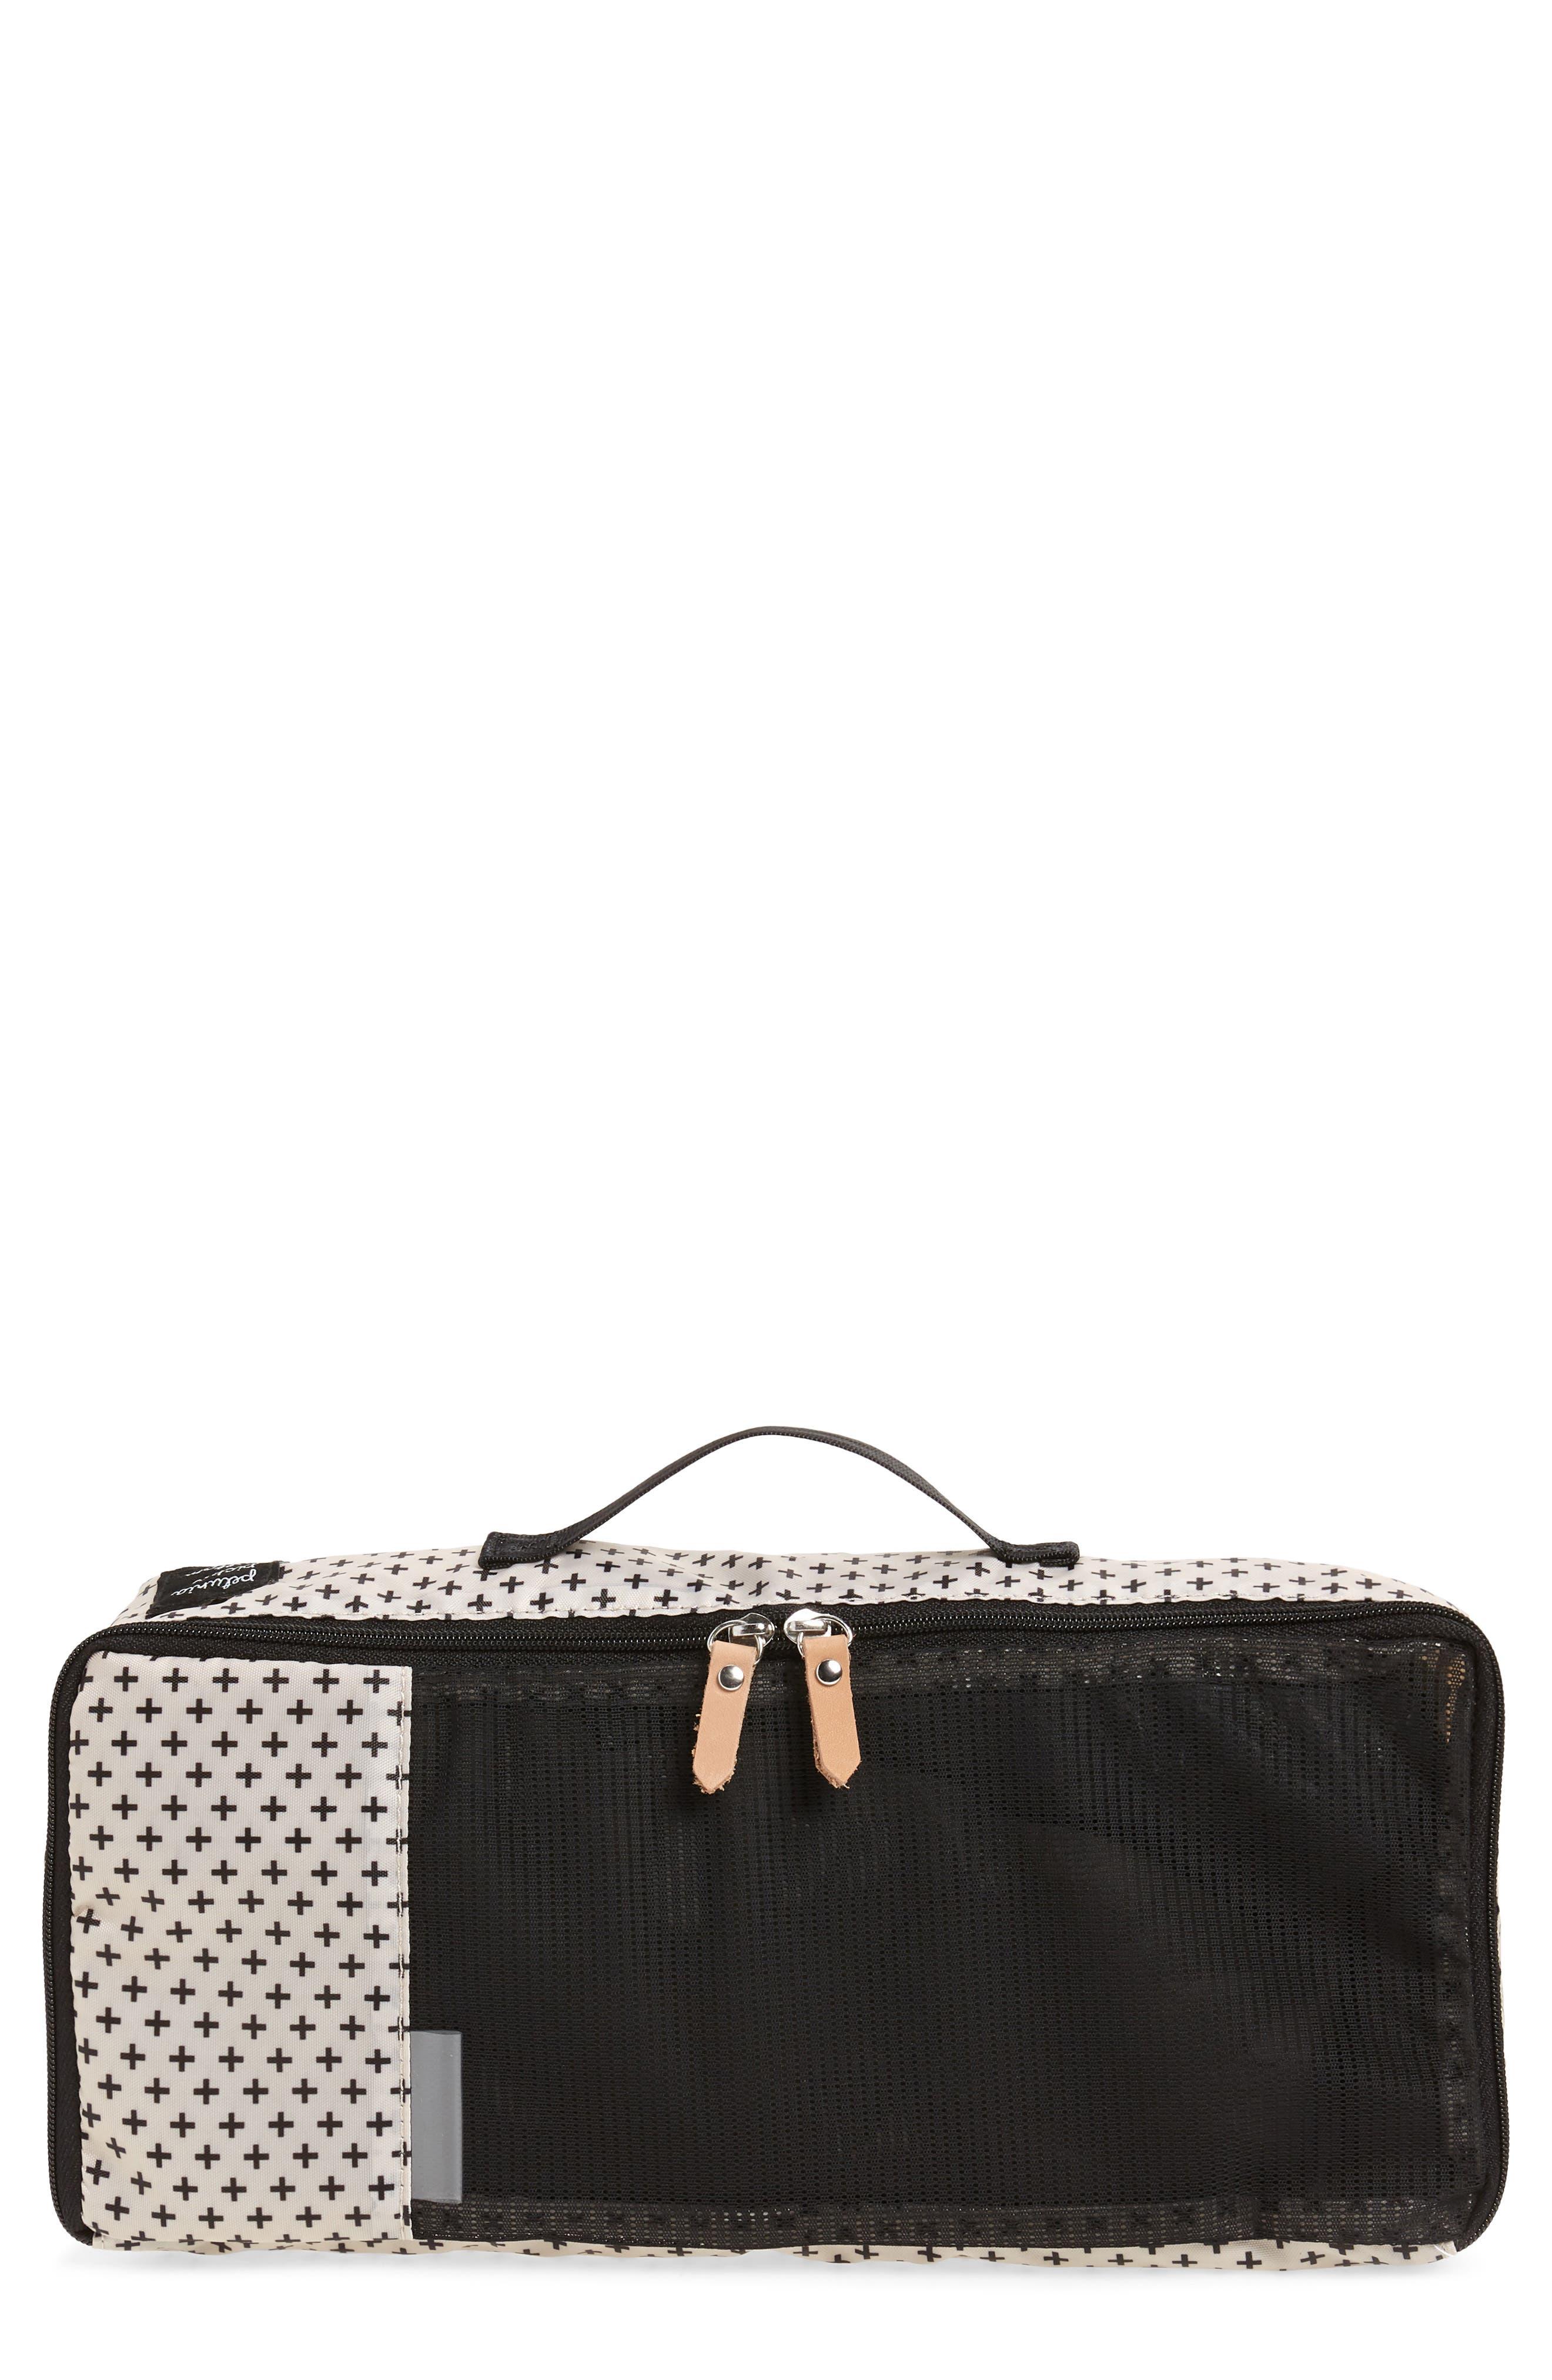 Max Pixel in Positive Bag,                         Main,                         color, 111